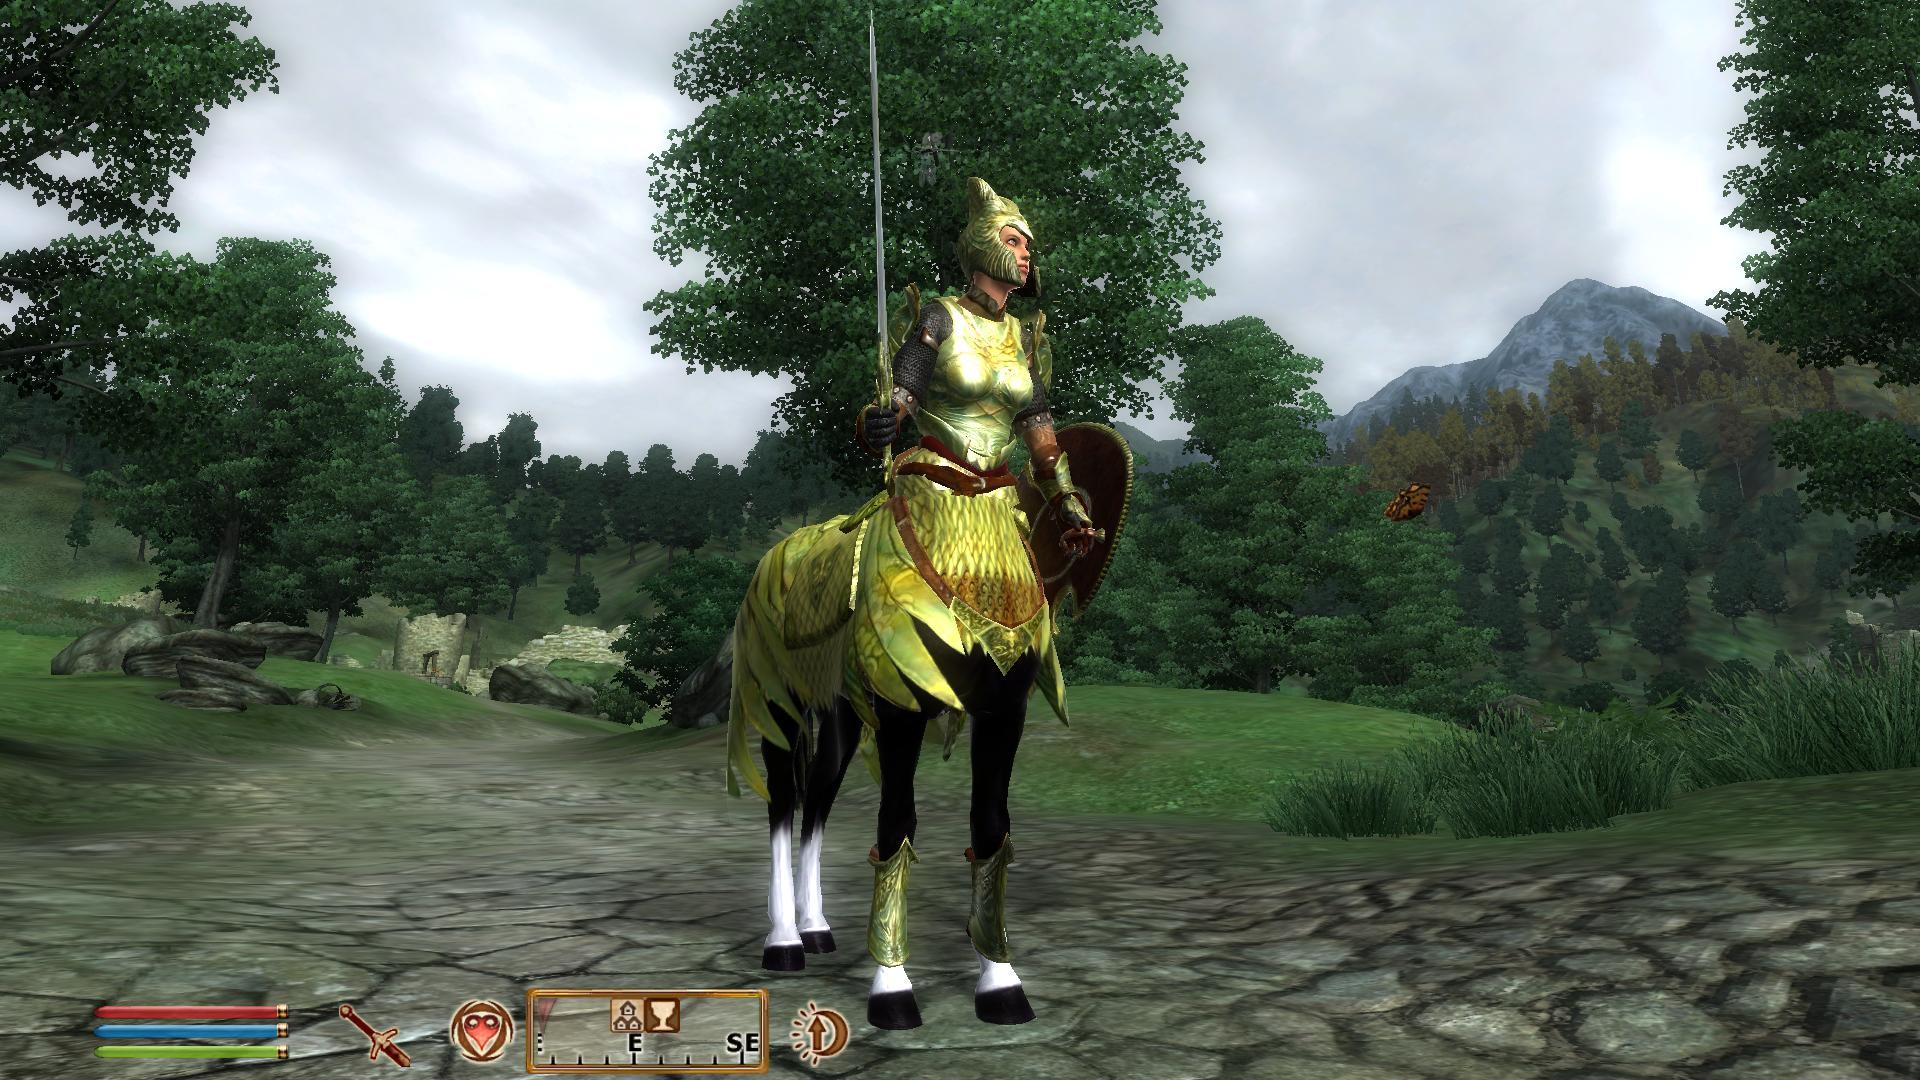 08 - The Elder Scrolls 4: Oblivion